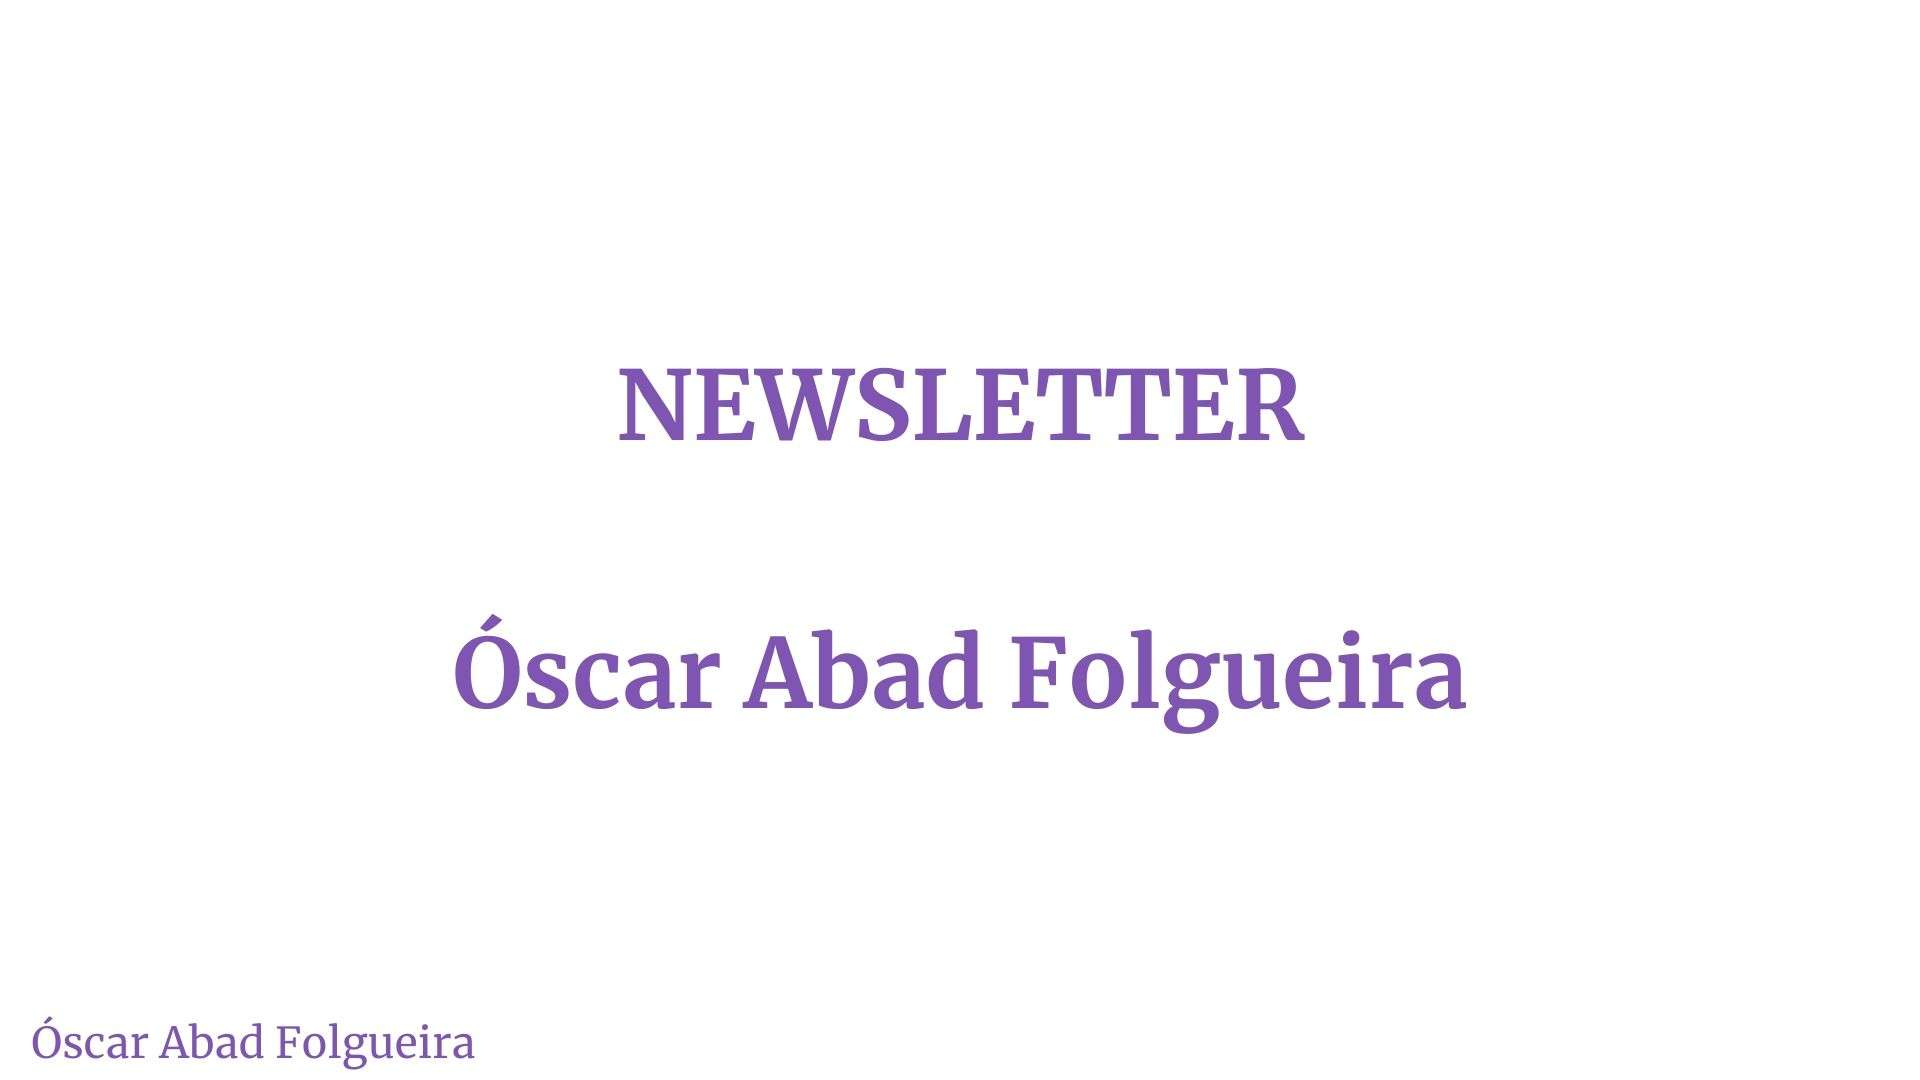 Newsletter Óscar Abad Folgueira